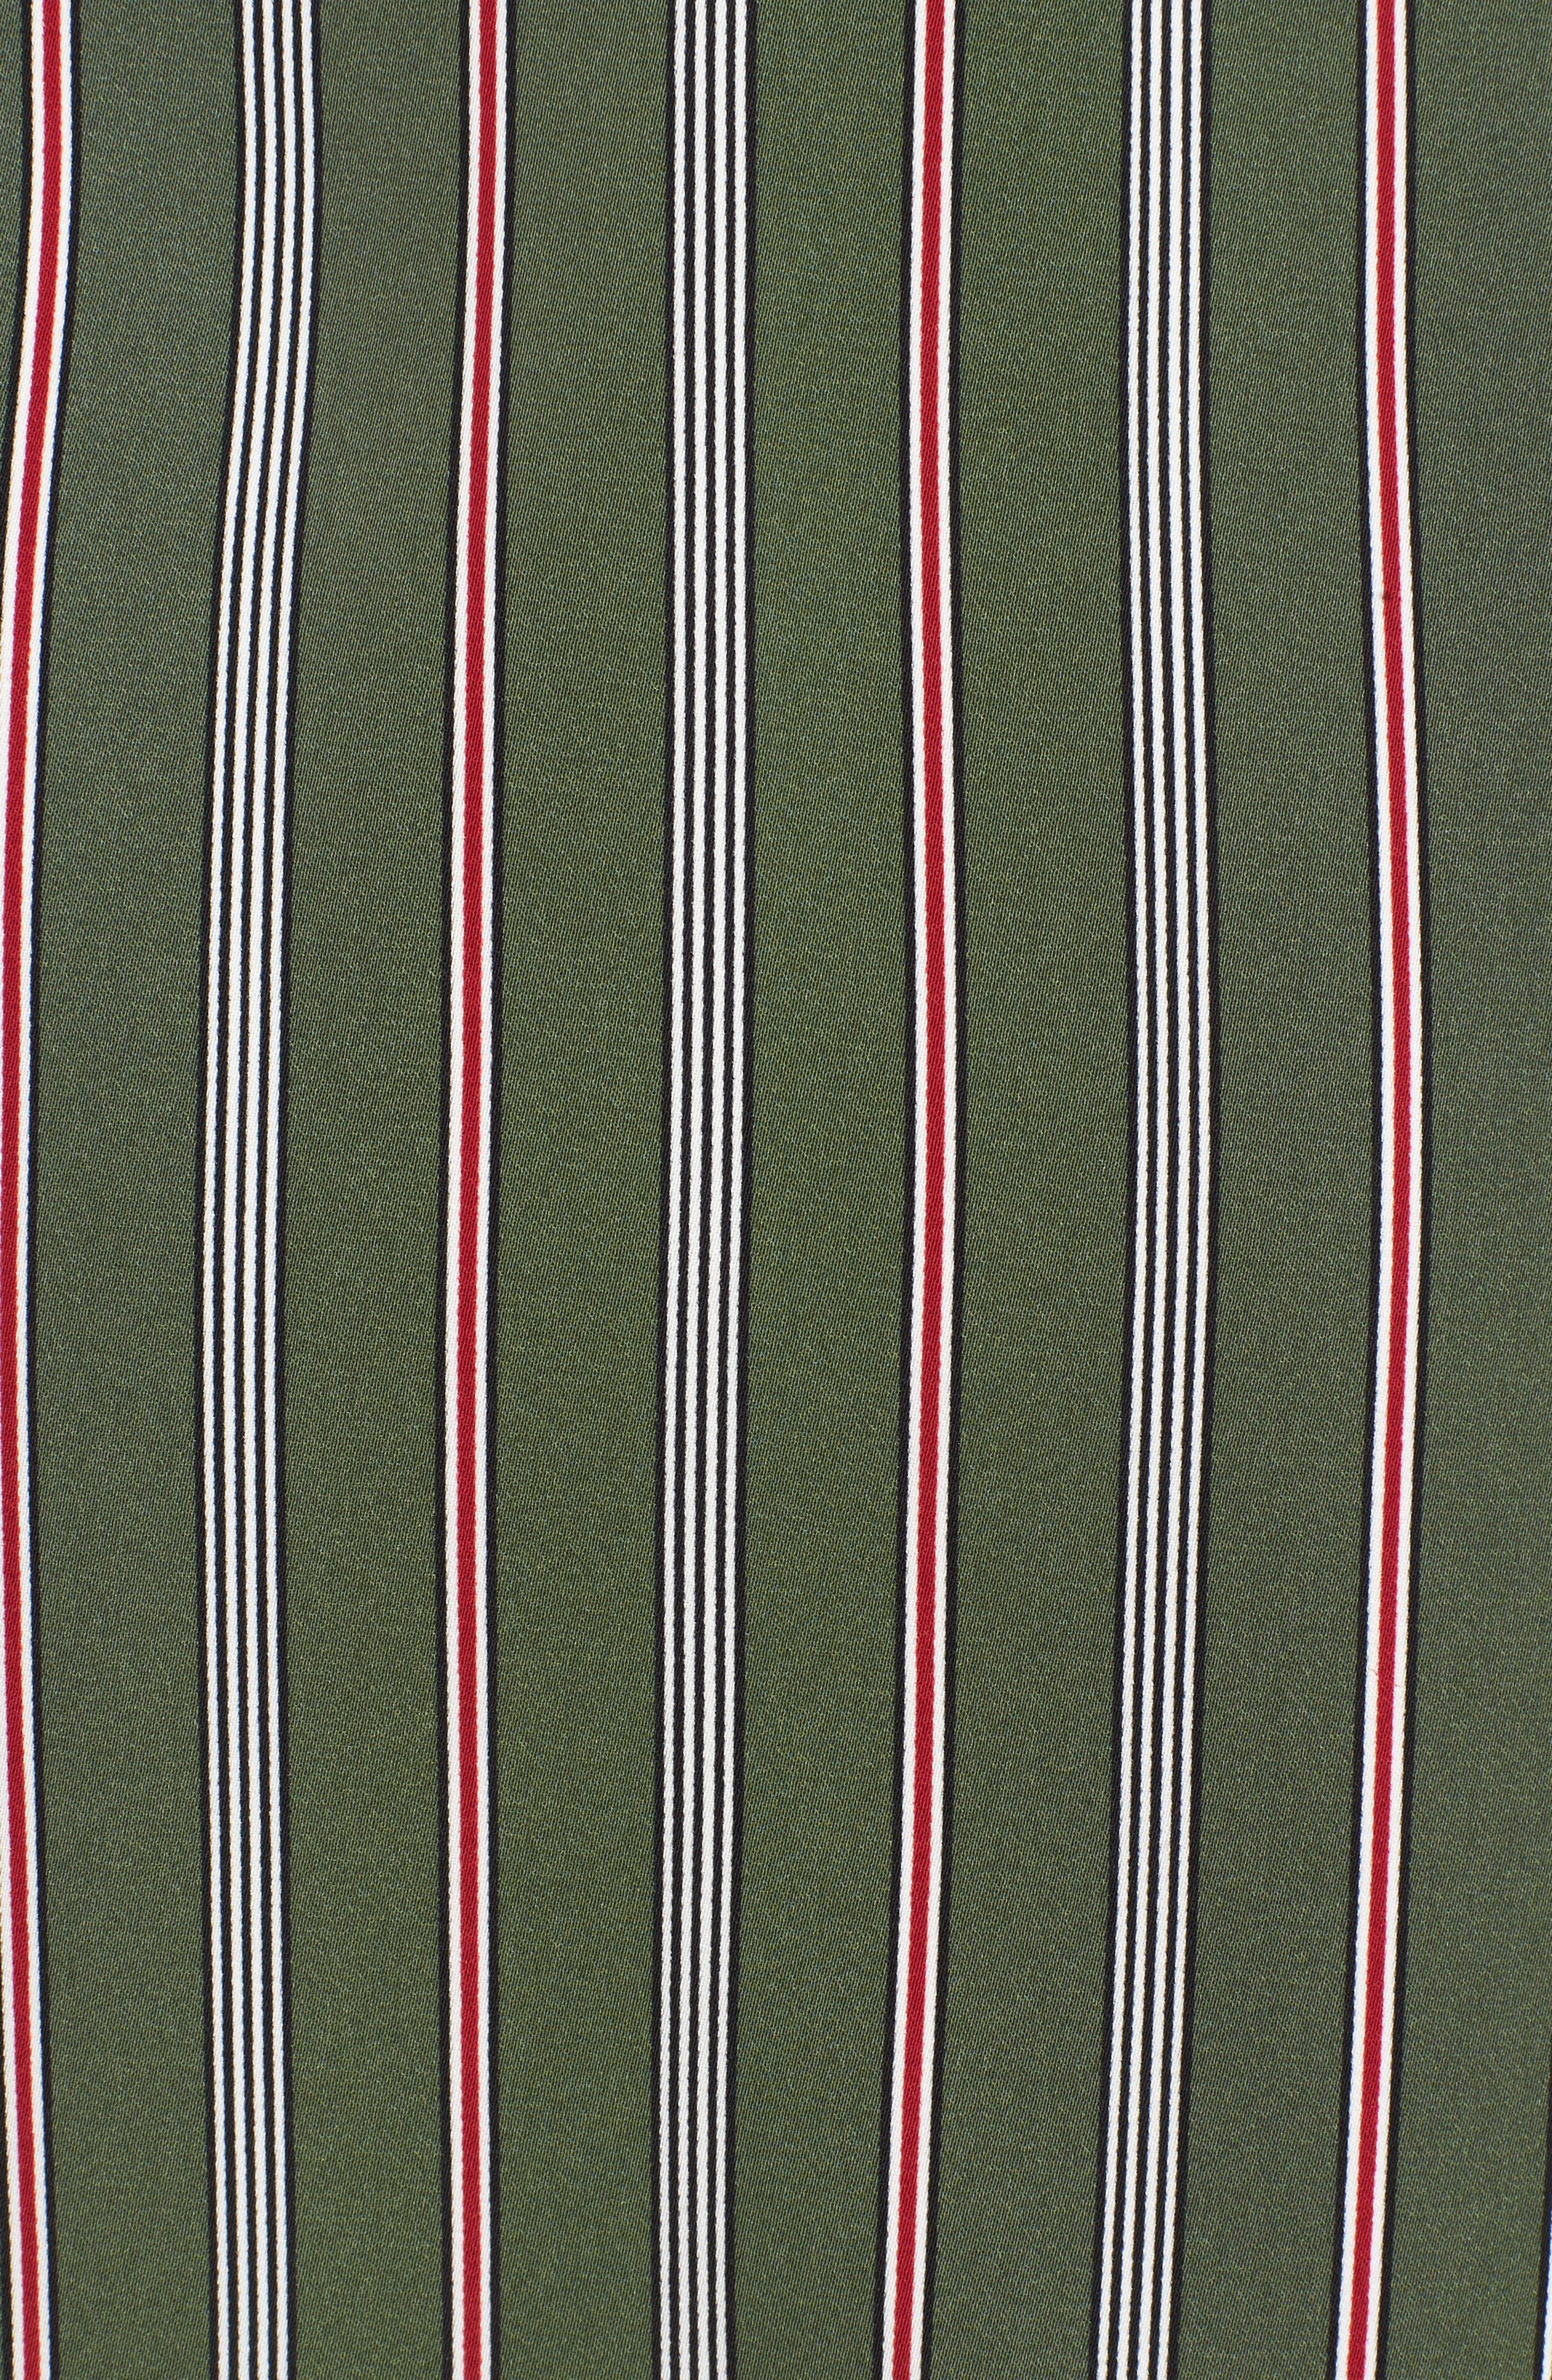 Axial Stripe Miniskirt,                             Alternate thumbnail 5, color,                             300